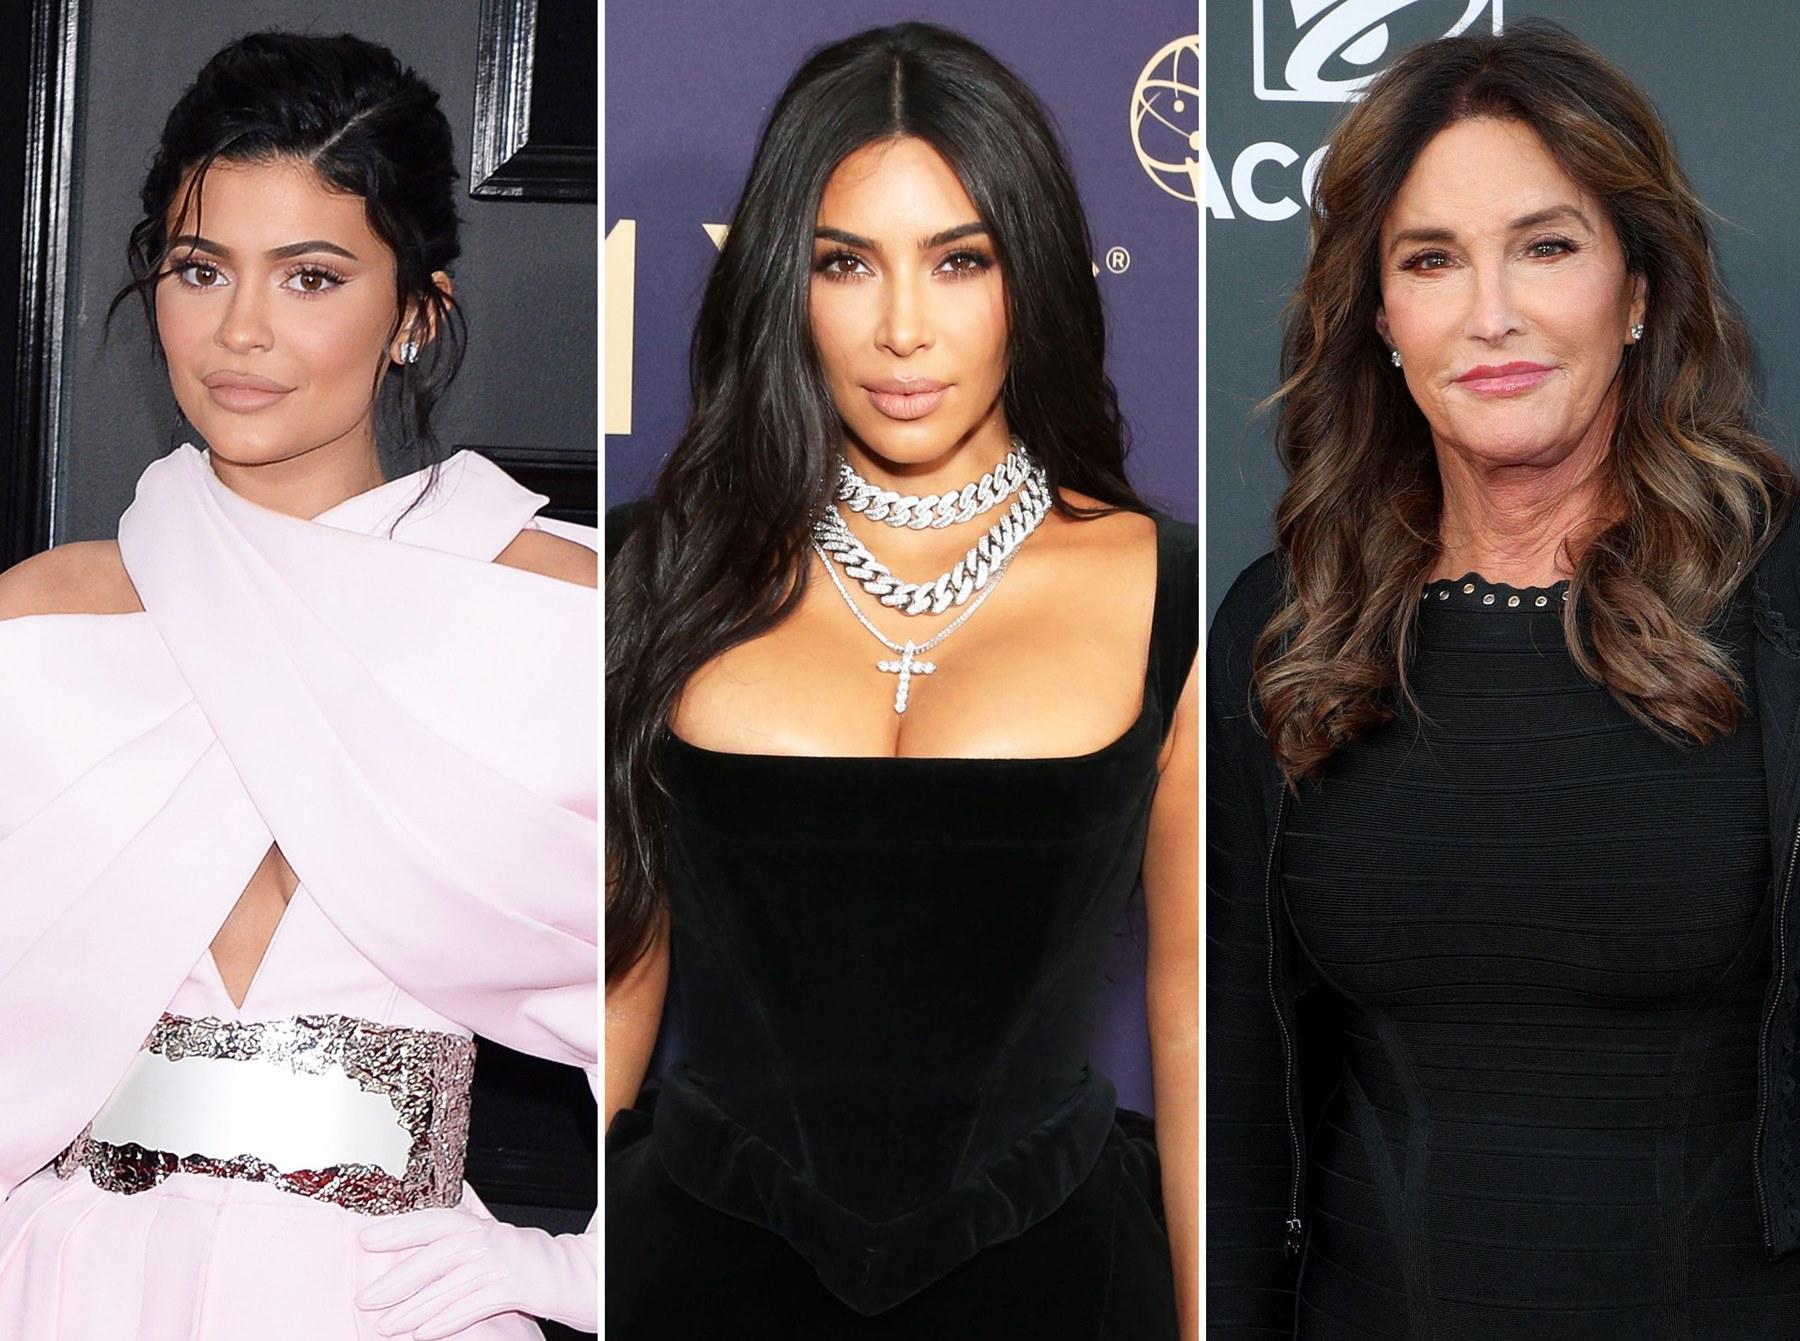 Kylie Jenner Kim Kardashian Caitlyn